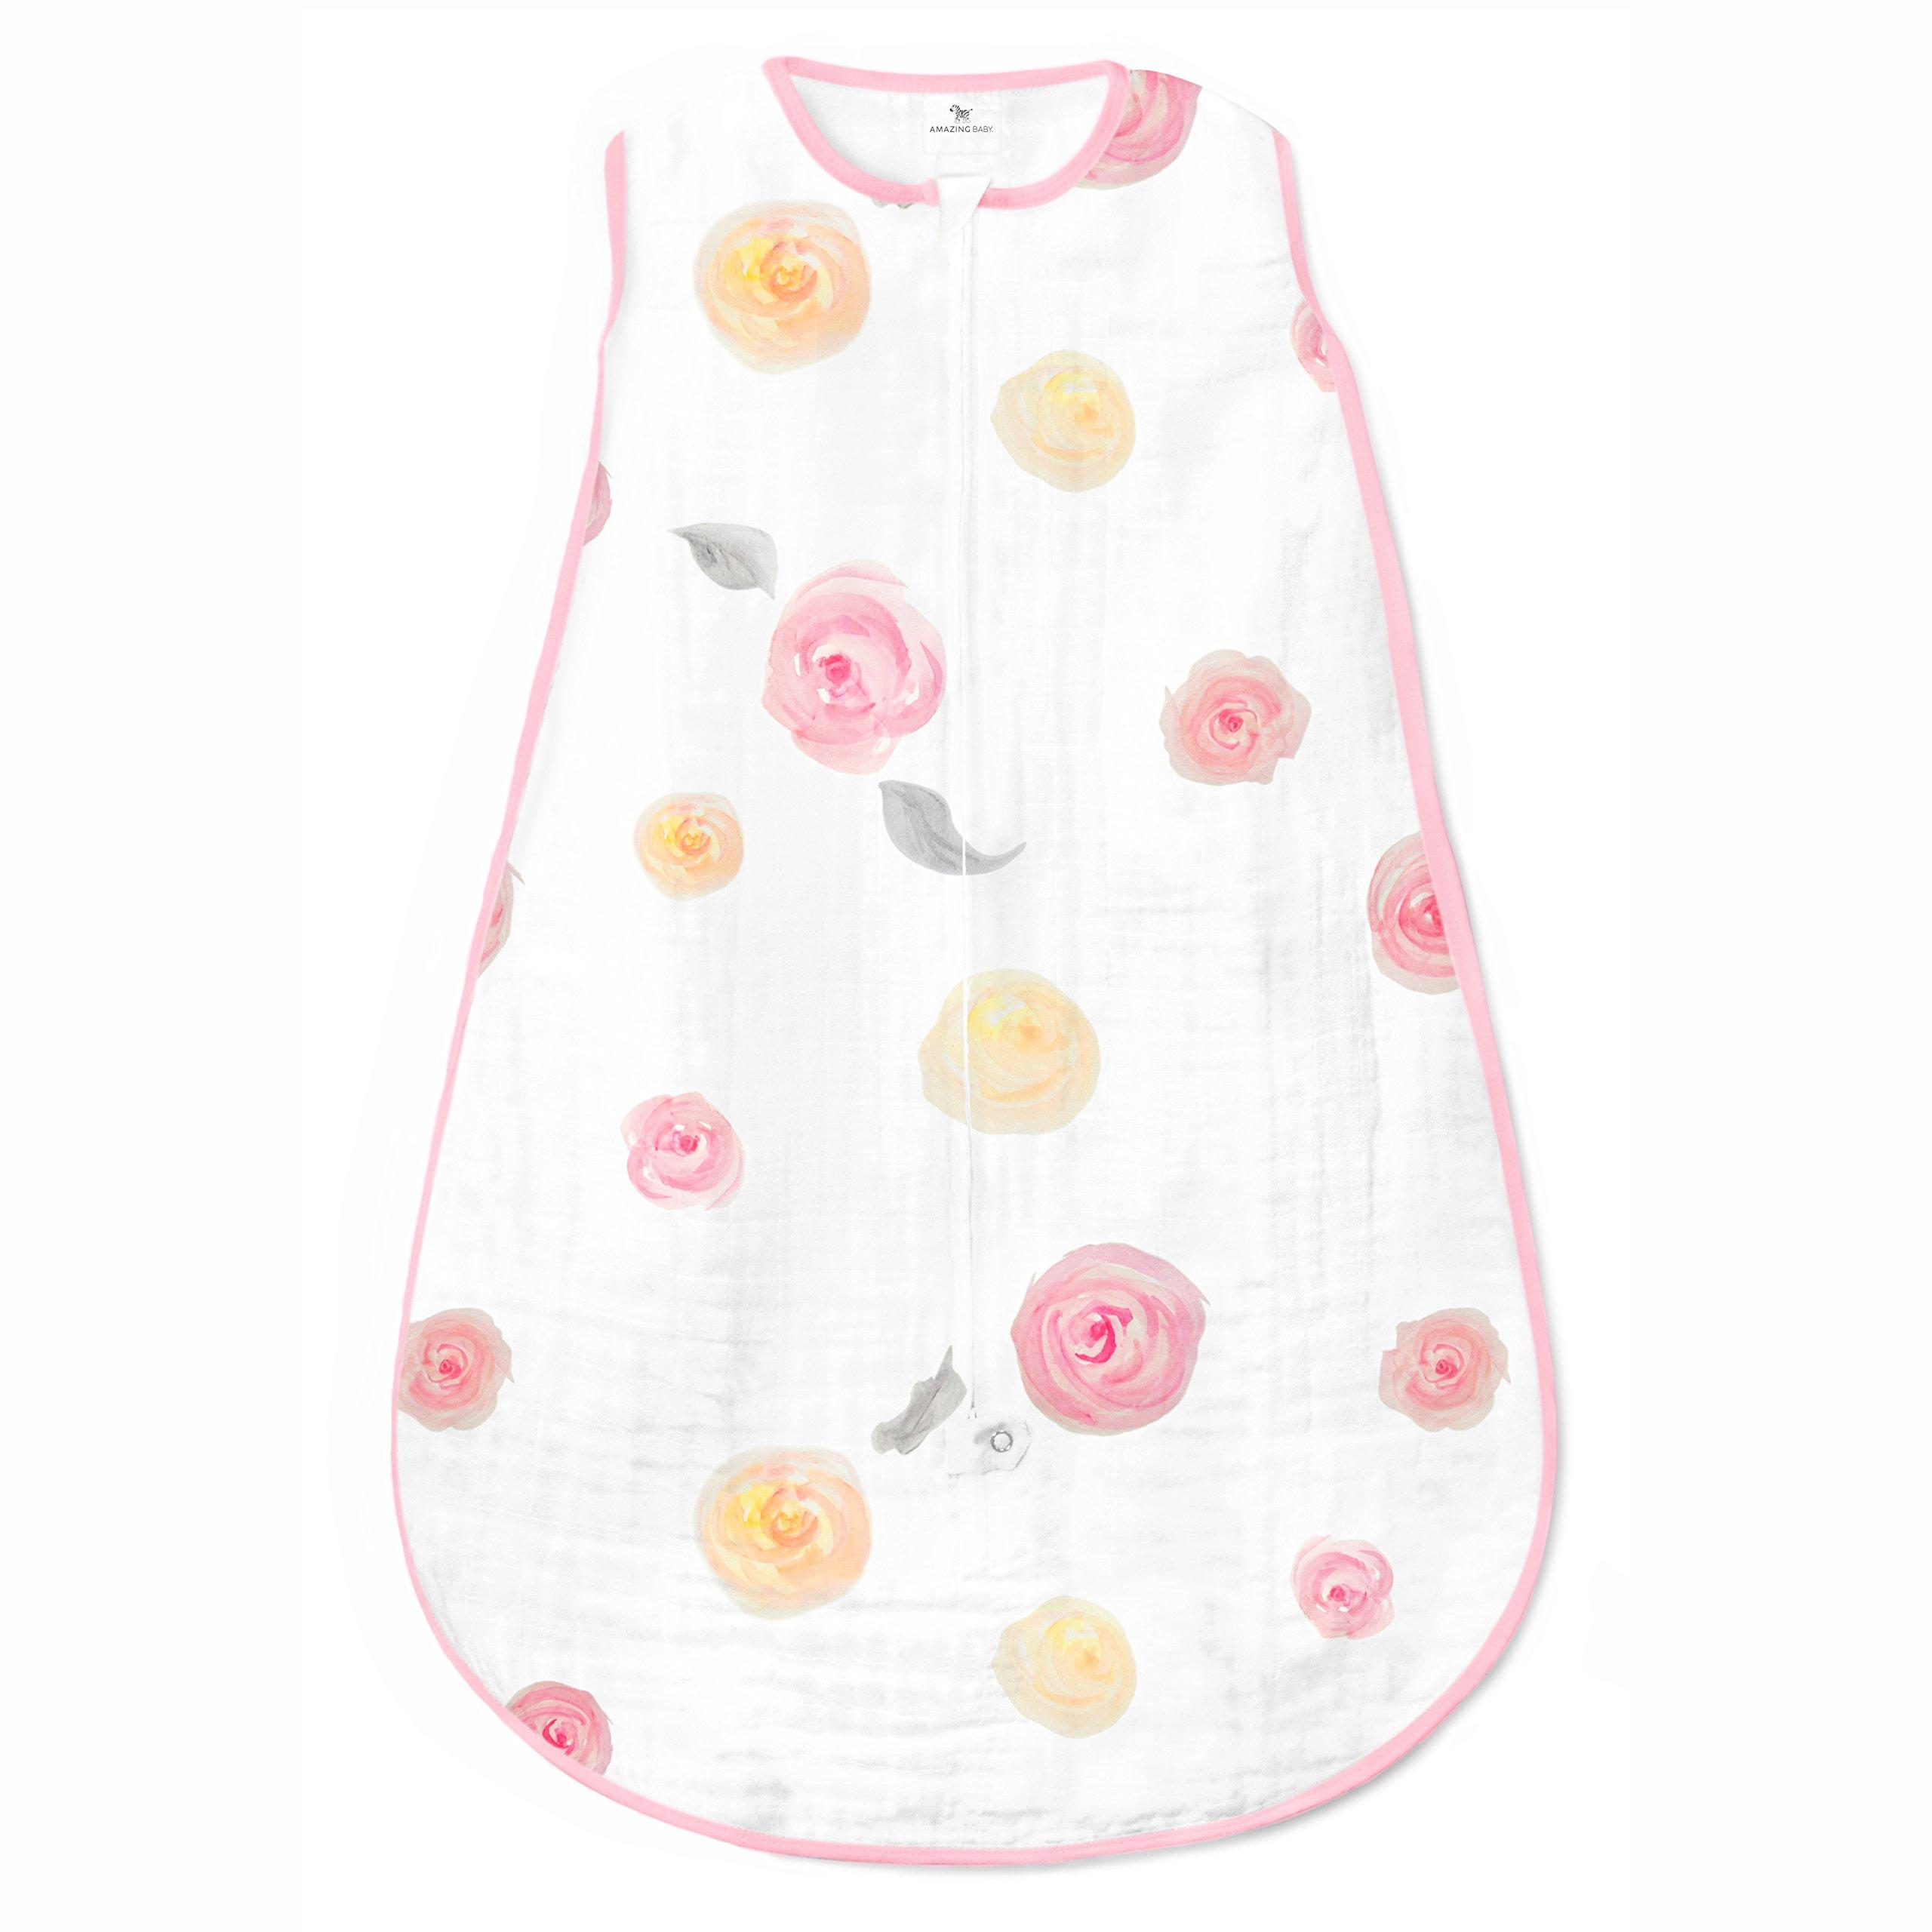 Amazing Baby Muslin Sleeping Sack with 2-Way Zipper, Watercolor Roses, Pink, Medium